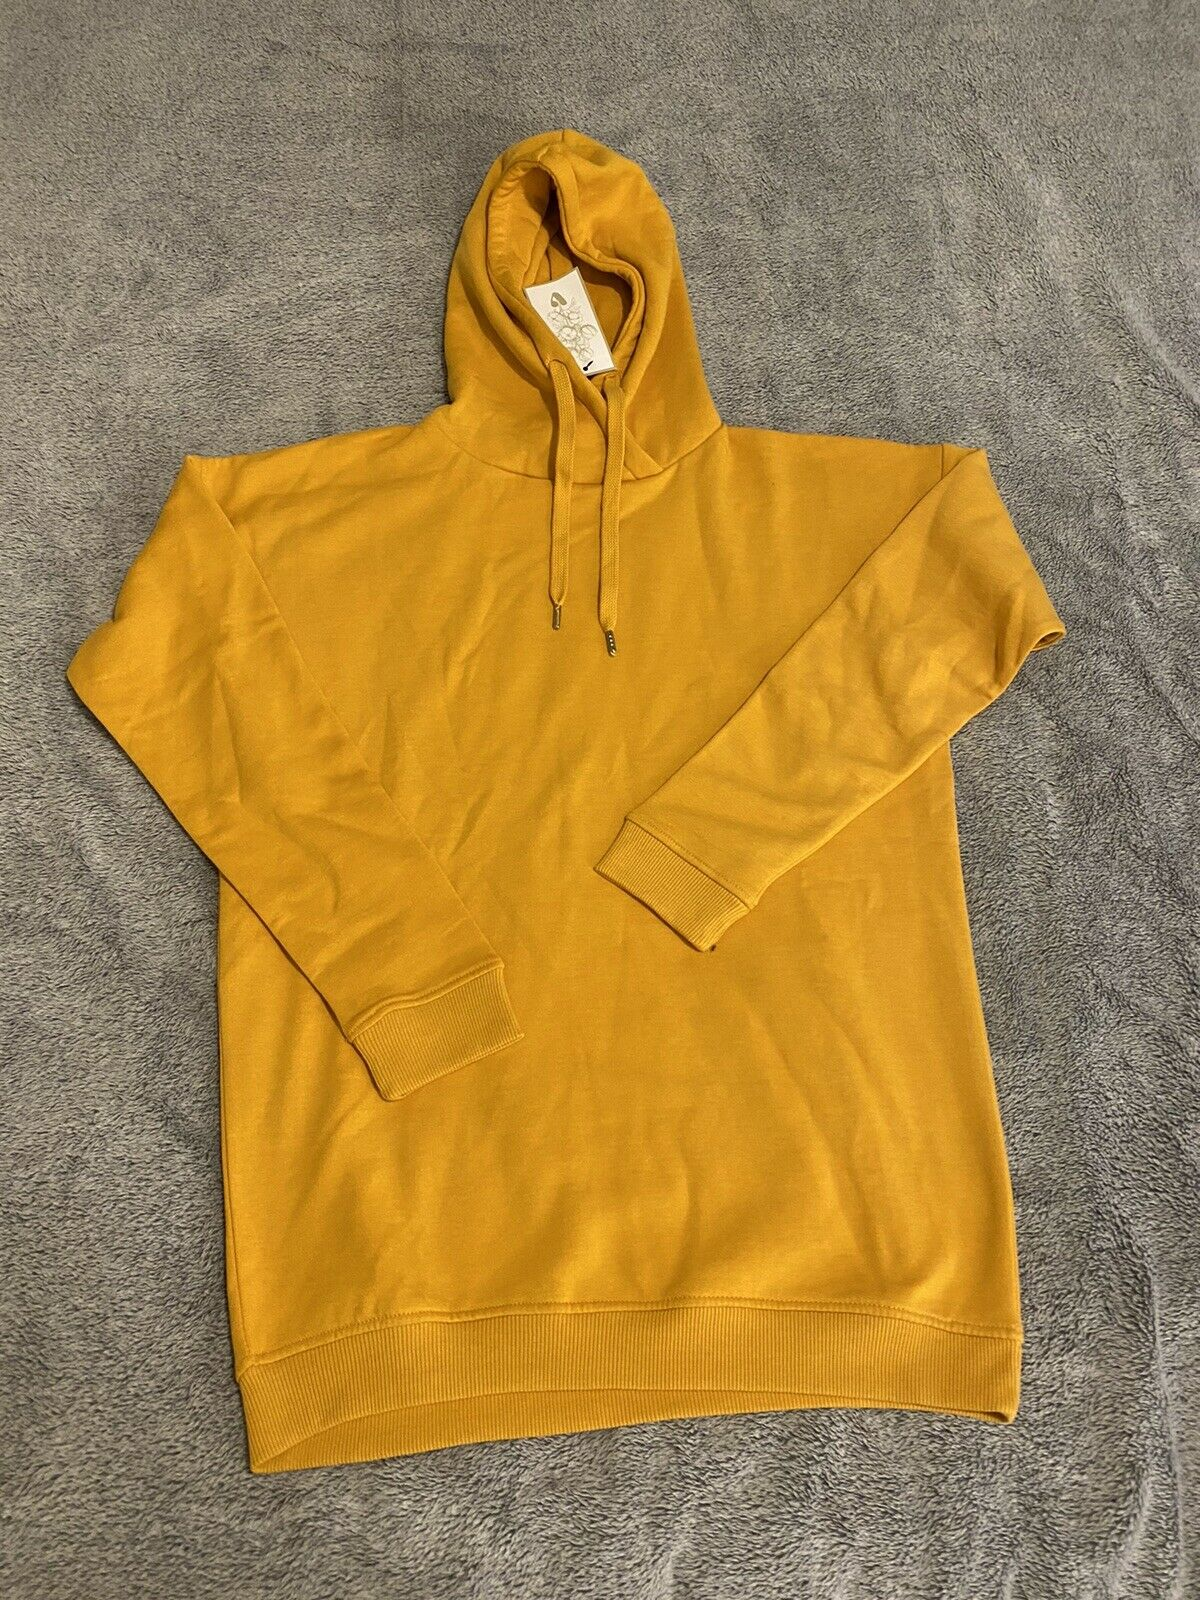 V by Very Yellow Marl Cross Neck Longline Hoodie UK 10 BNWT